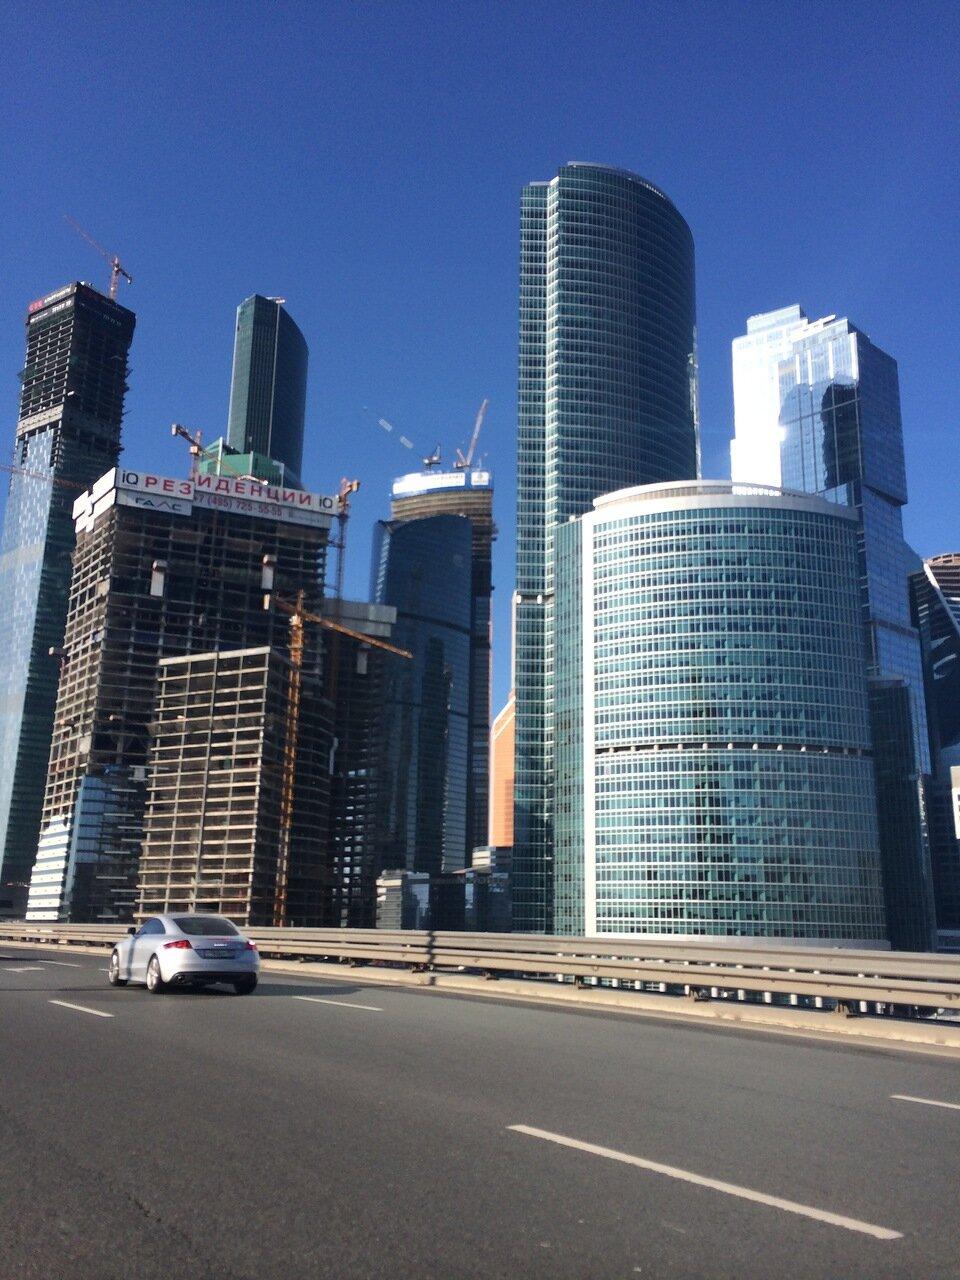 http://img-fotki.yandex.ru/get/5311/82260854.2ff/0_be033_9c794f03_XXXL.jpg